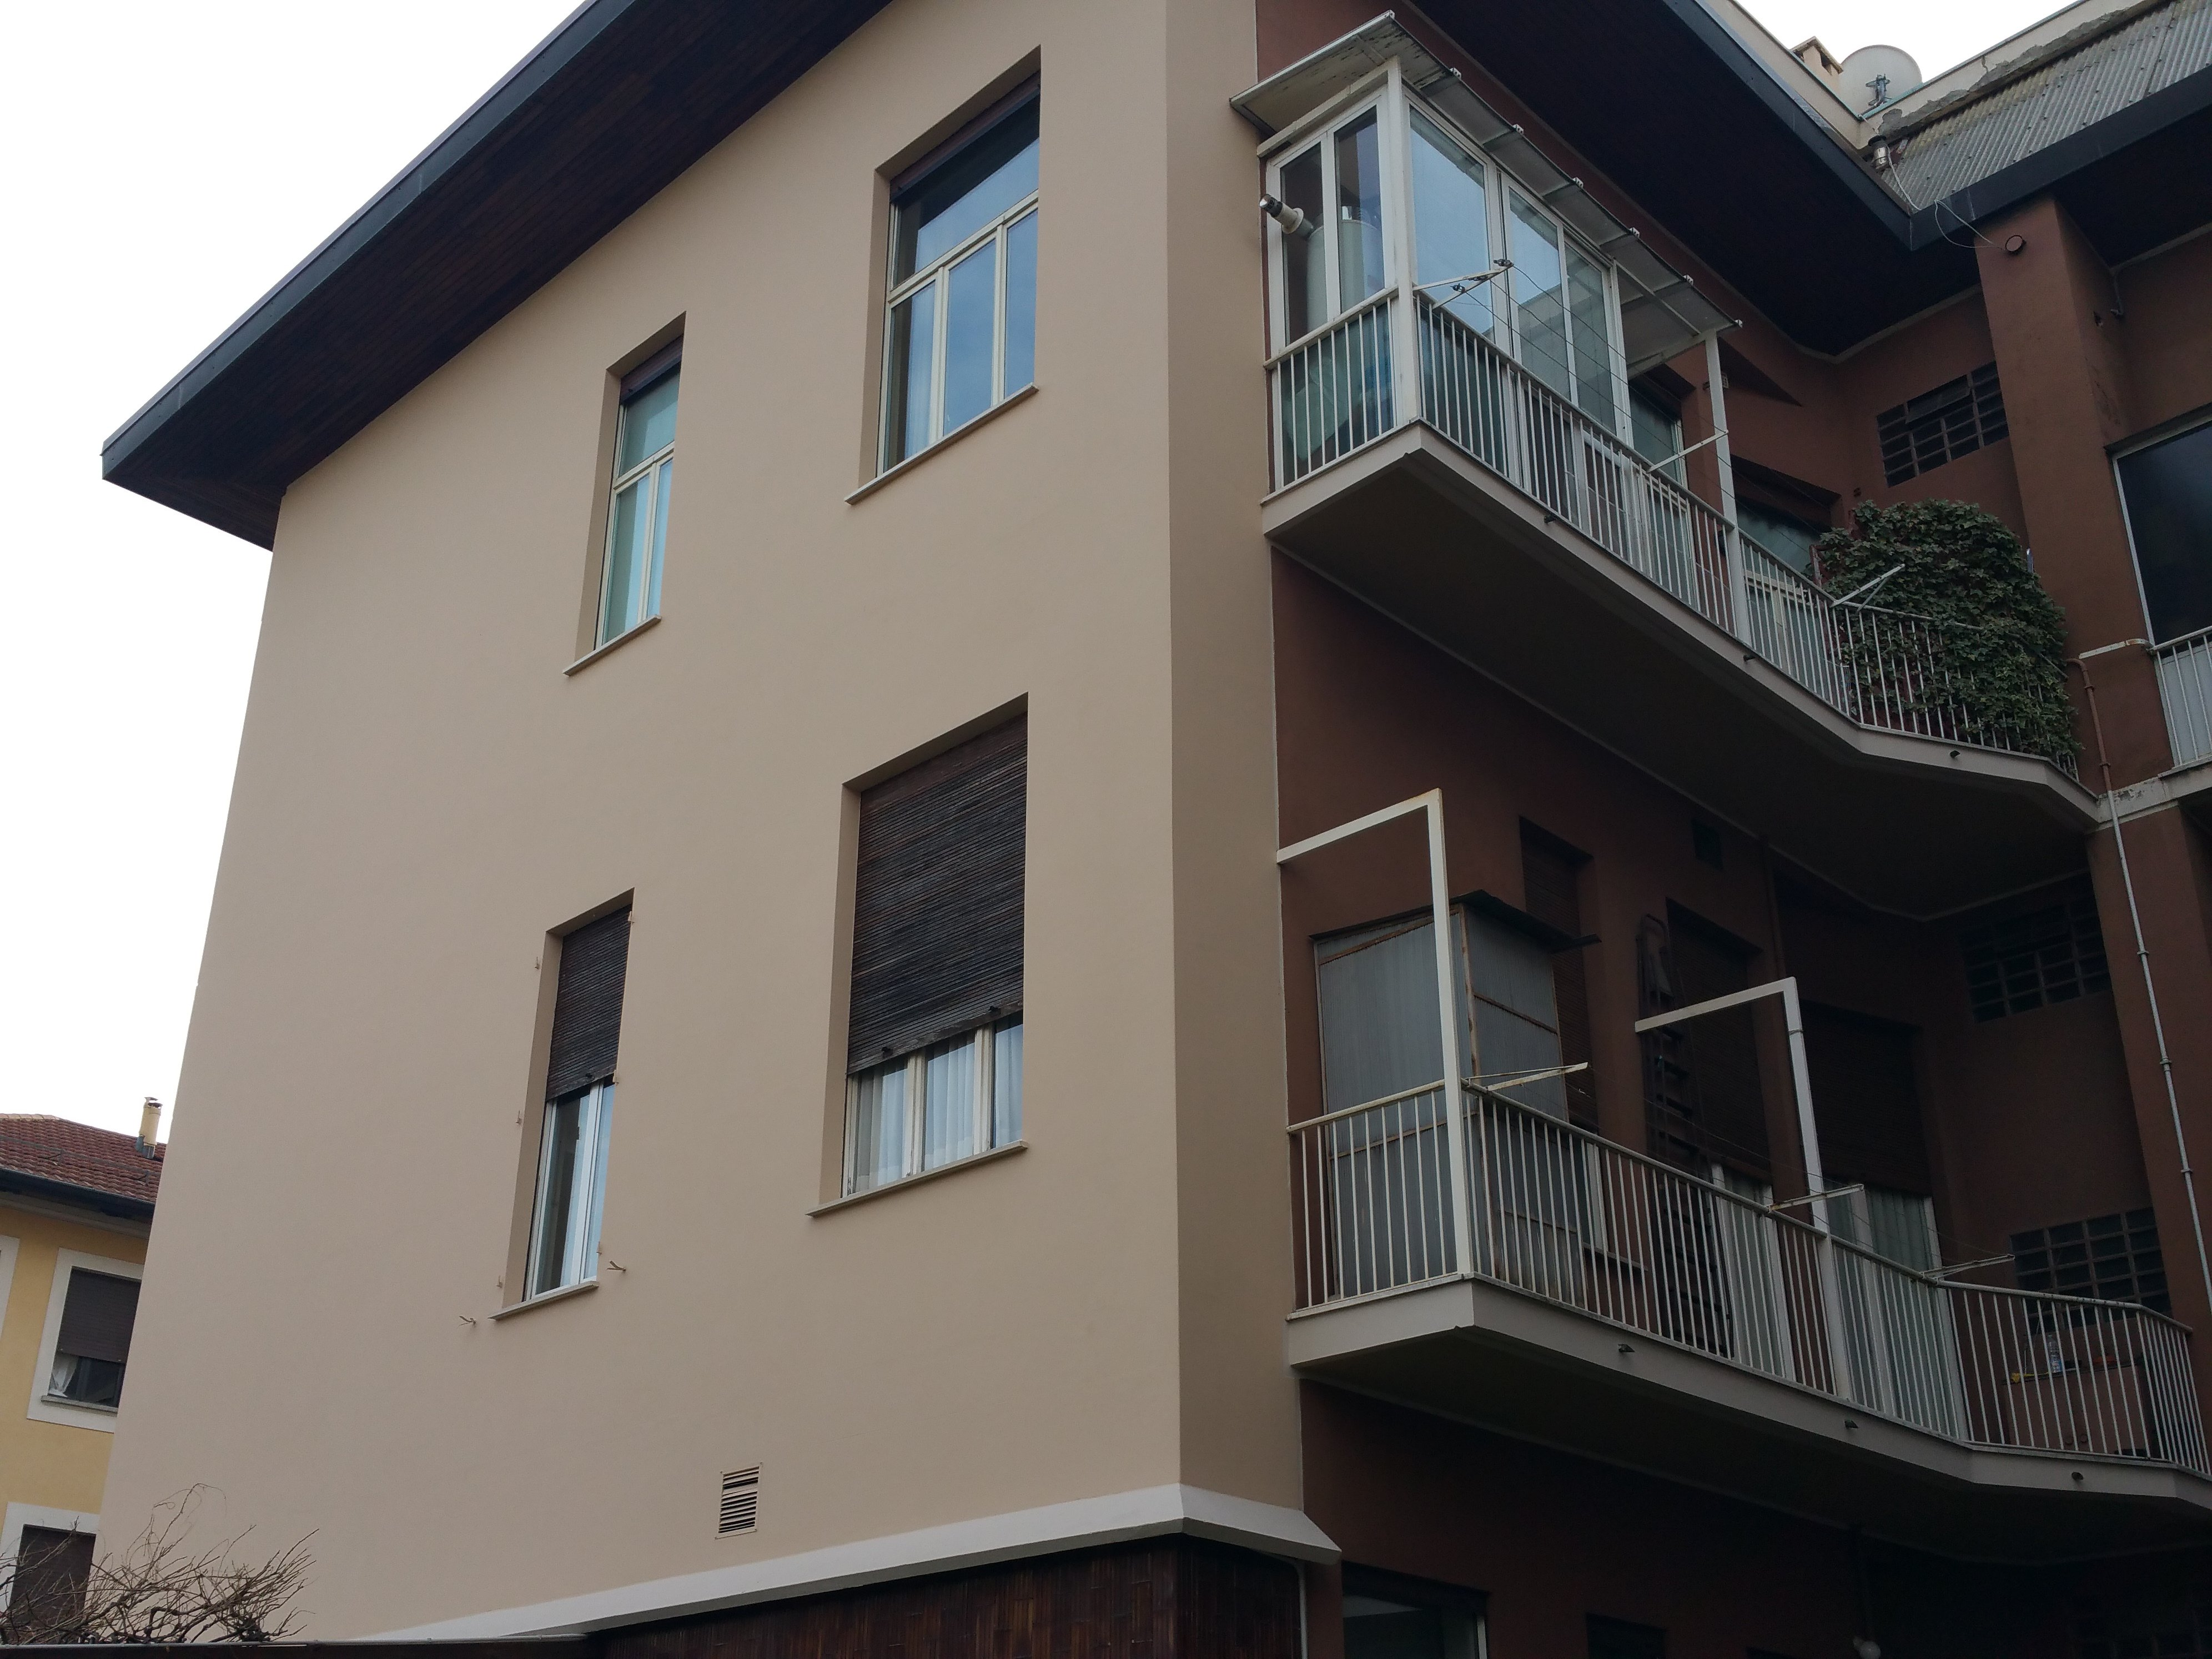 C.so Duca d'Aosta n.4 - Torino